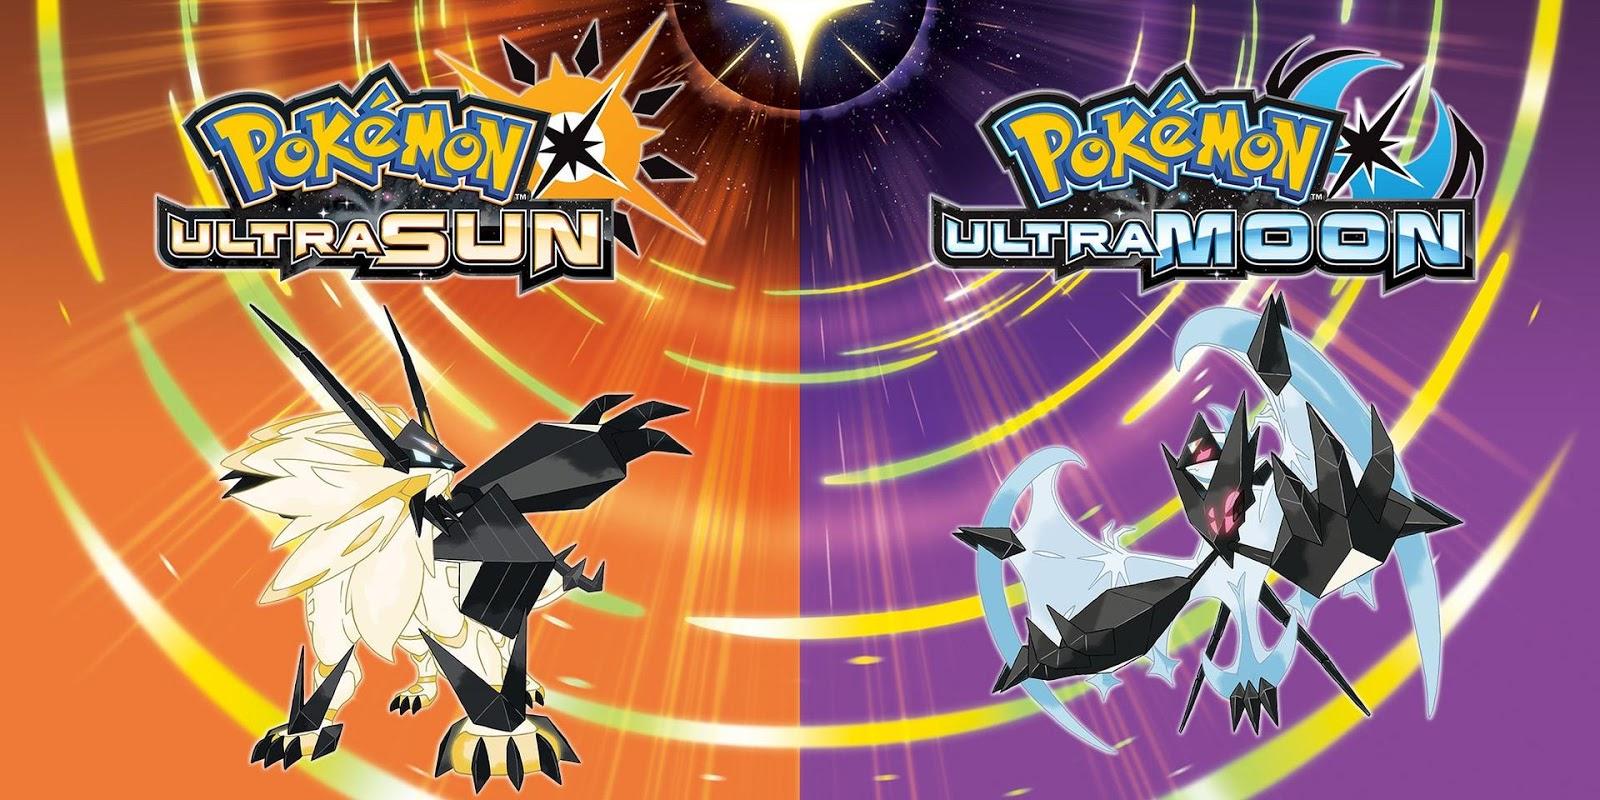 Pokémon Ultra Sun e Moon ganham novo trailer, prometendo novidades sobre Alola